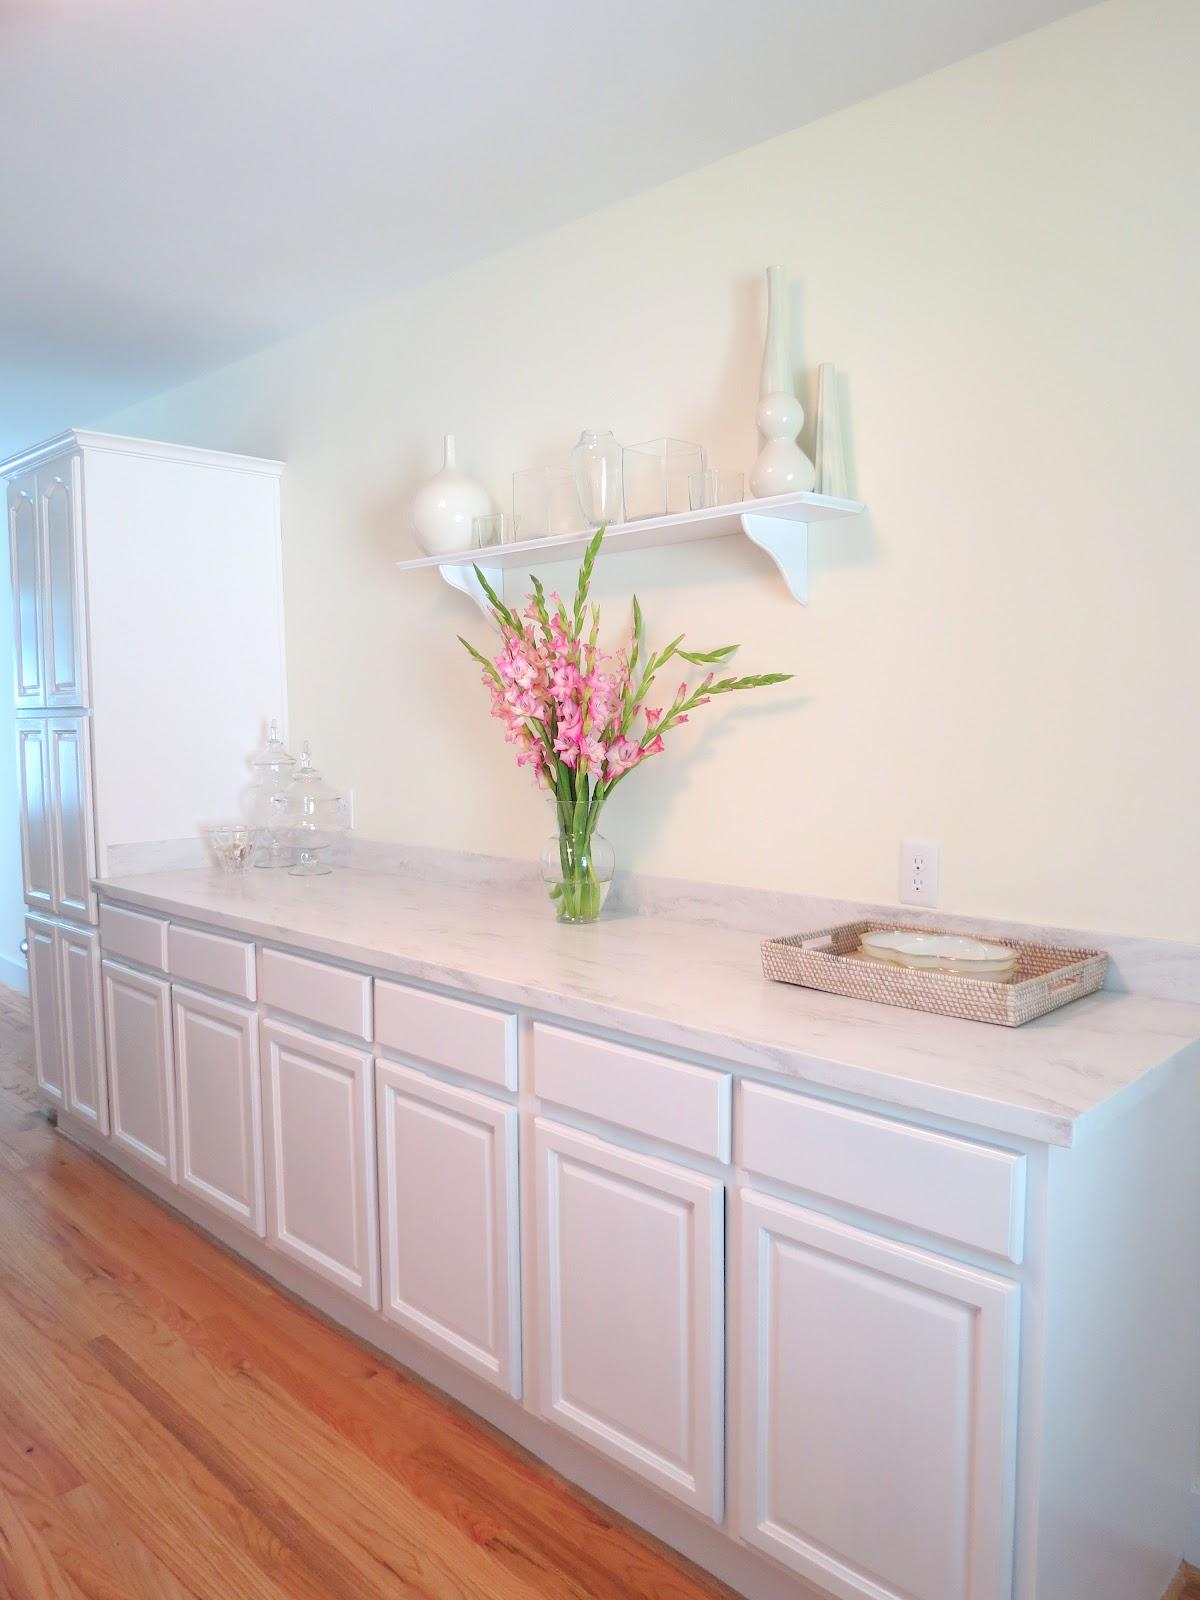 Raincloud rain cloud in kitchen picture white painted kitchen cabinets